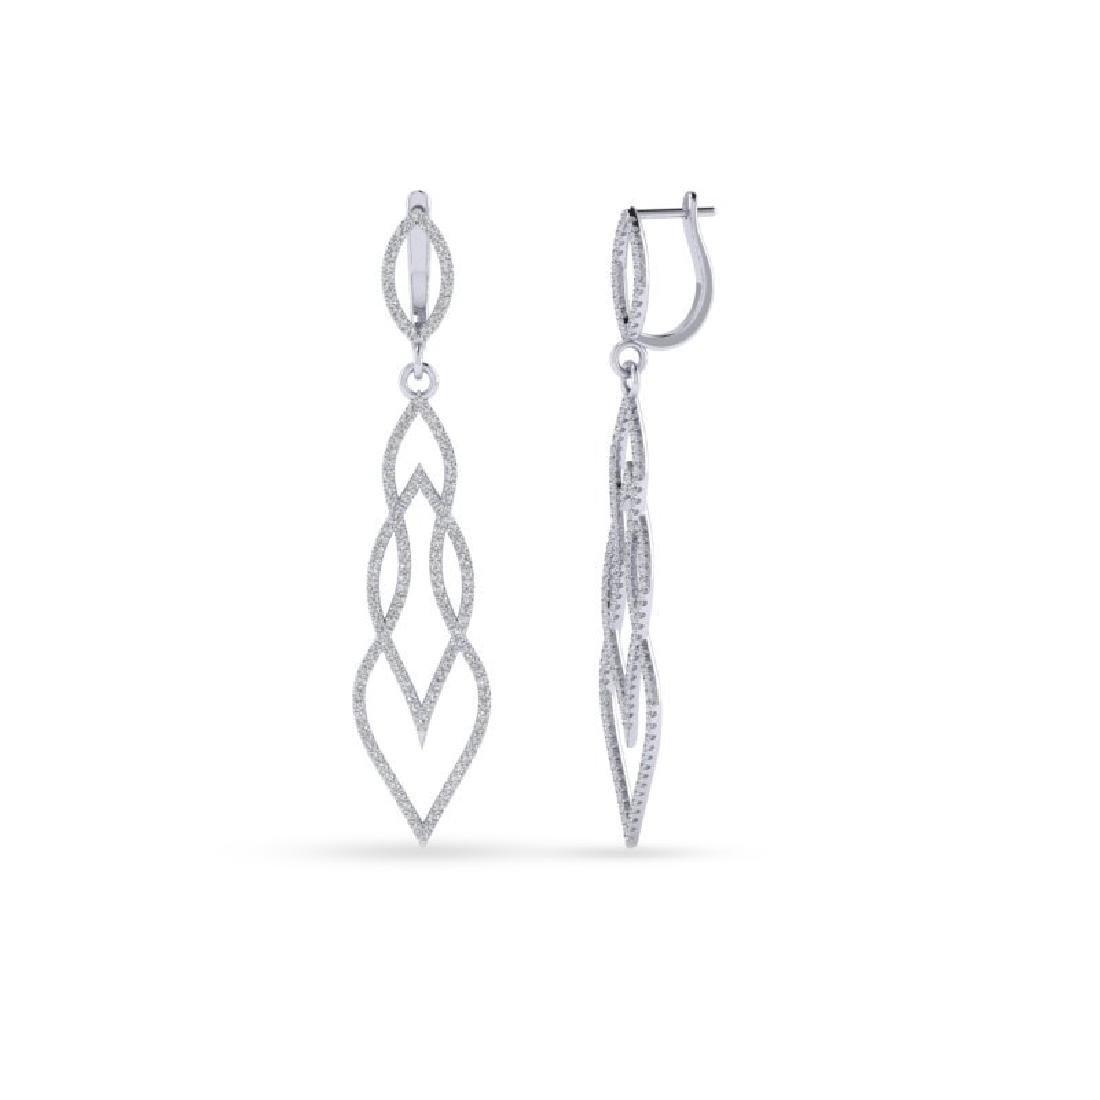 1.90 CTW Micro Pave VS/SI Diamond Earrings 14K White - 2